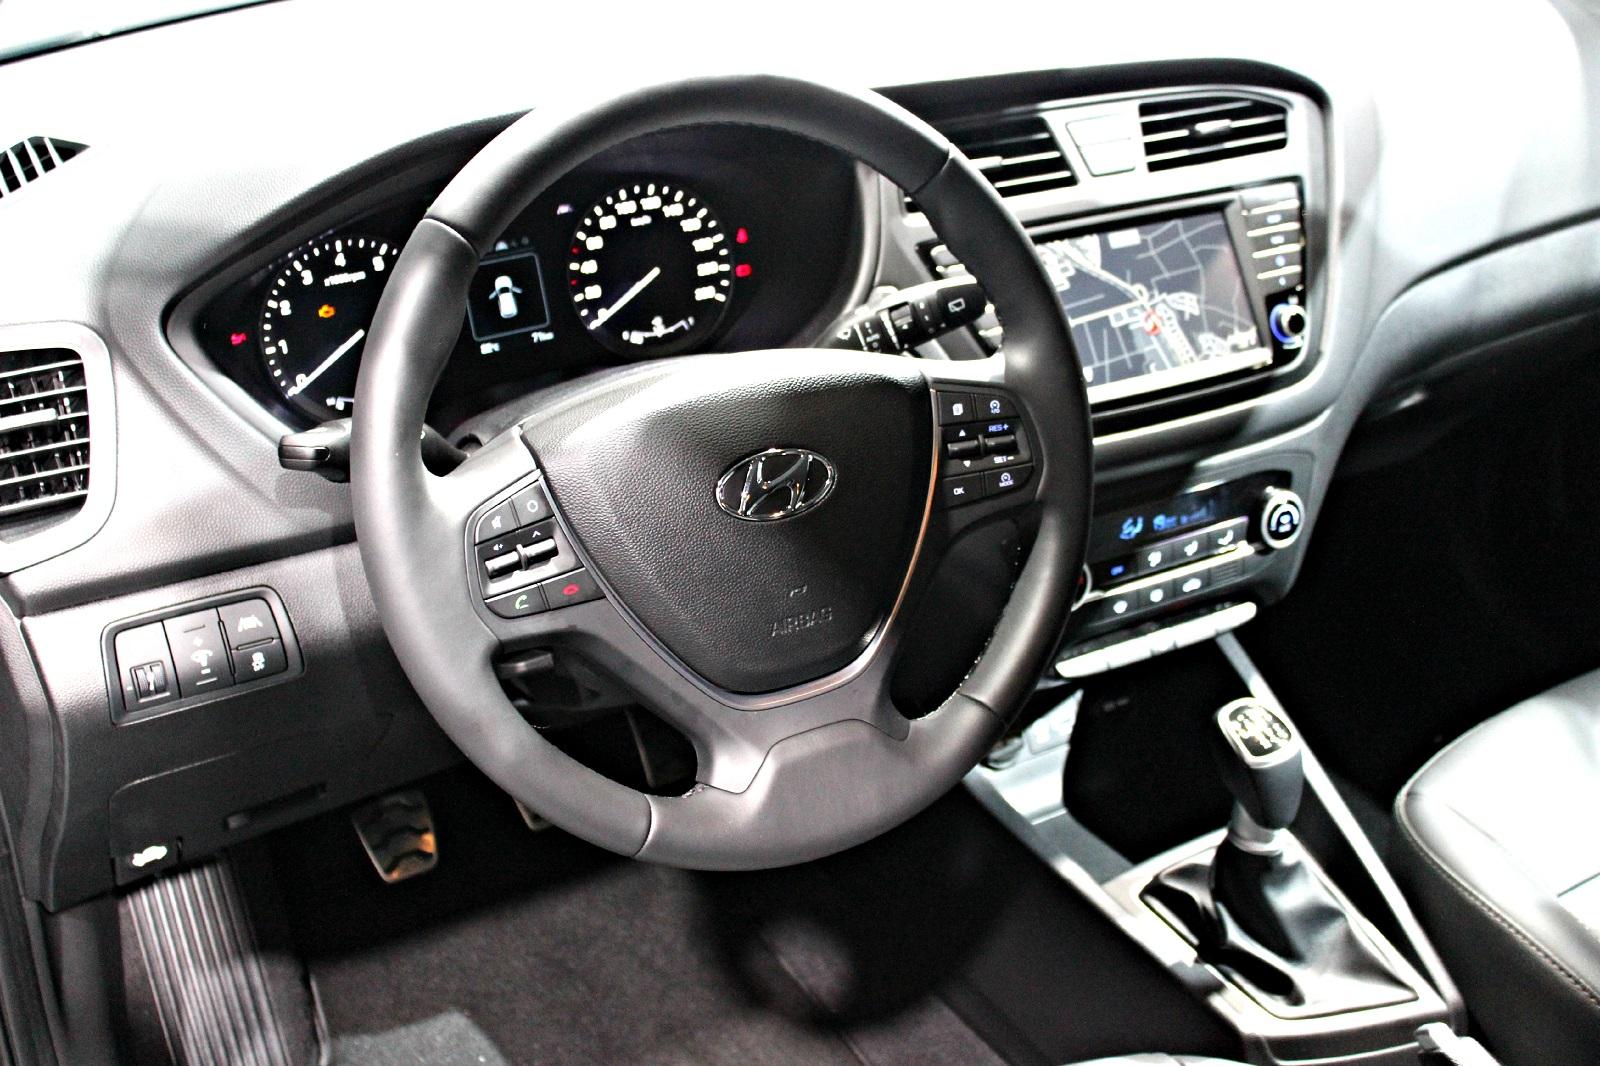 Hyundai i20 active rat des villes et des champs vid o for Interieur hyundai i20